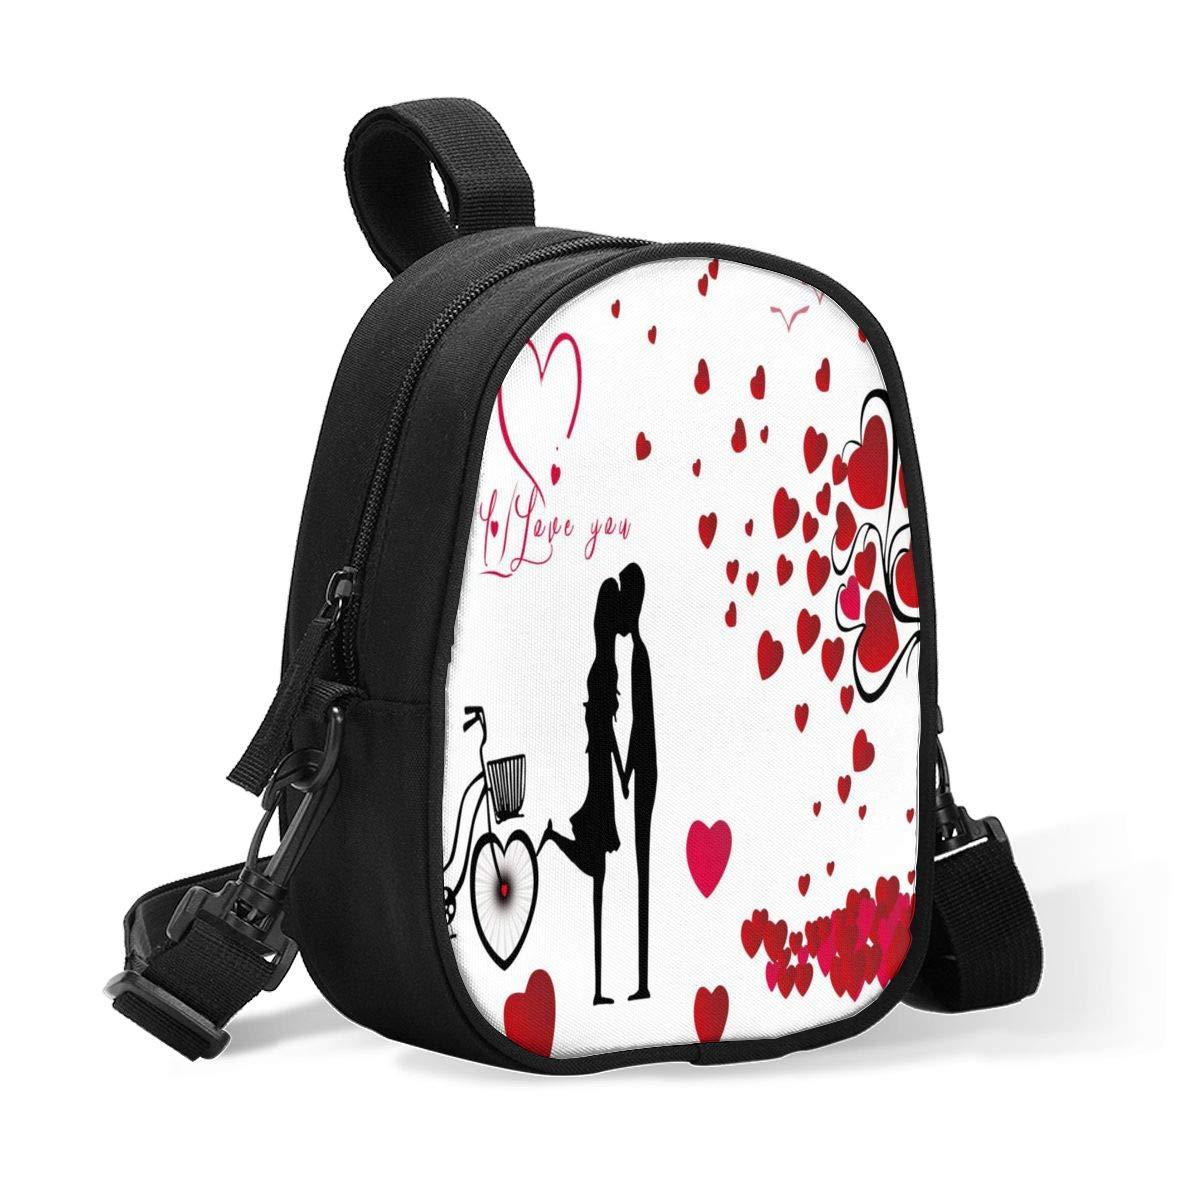 Insulated Baby Bottle Bag Romantic Beauty For Valentines Day Multi-Function Breastmilk Cooler Bag & Lunch Bag, Fit As Wine Carrier Or For Milk Bottles, For Nursing Mom Back To Work For 2 Large Bottles